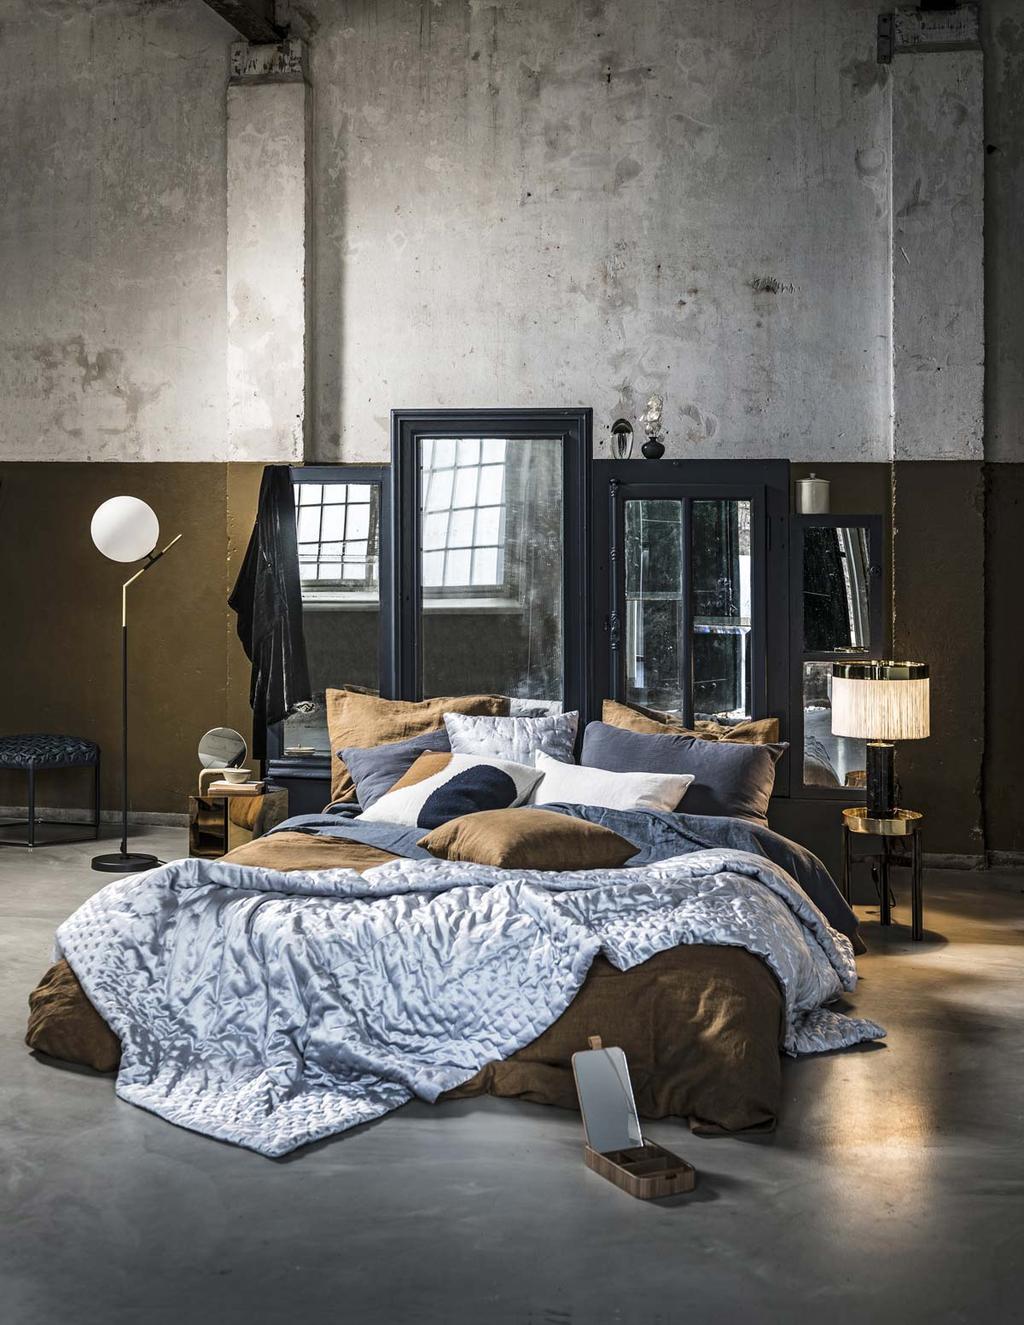 styling-spiegels-vtwonen-2019-editie2